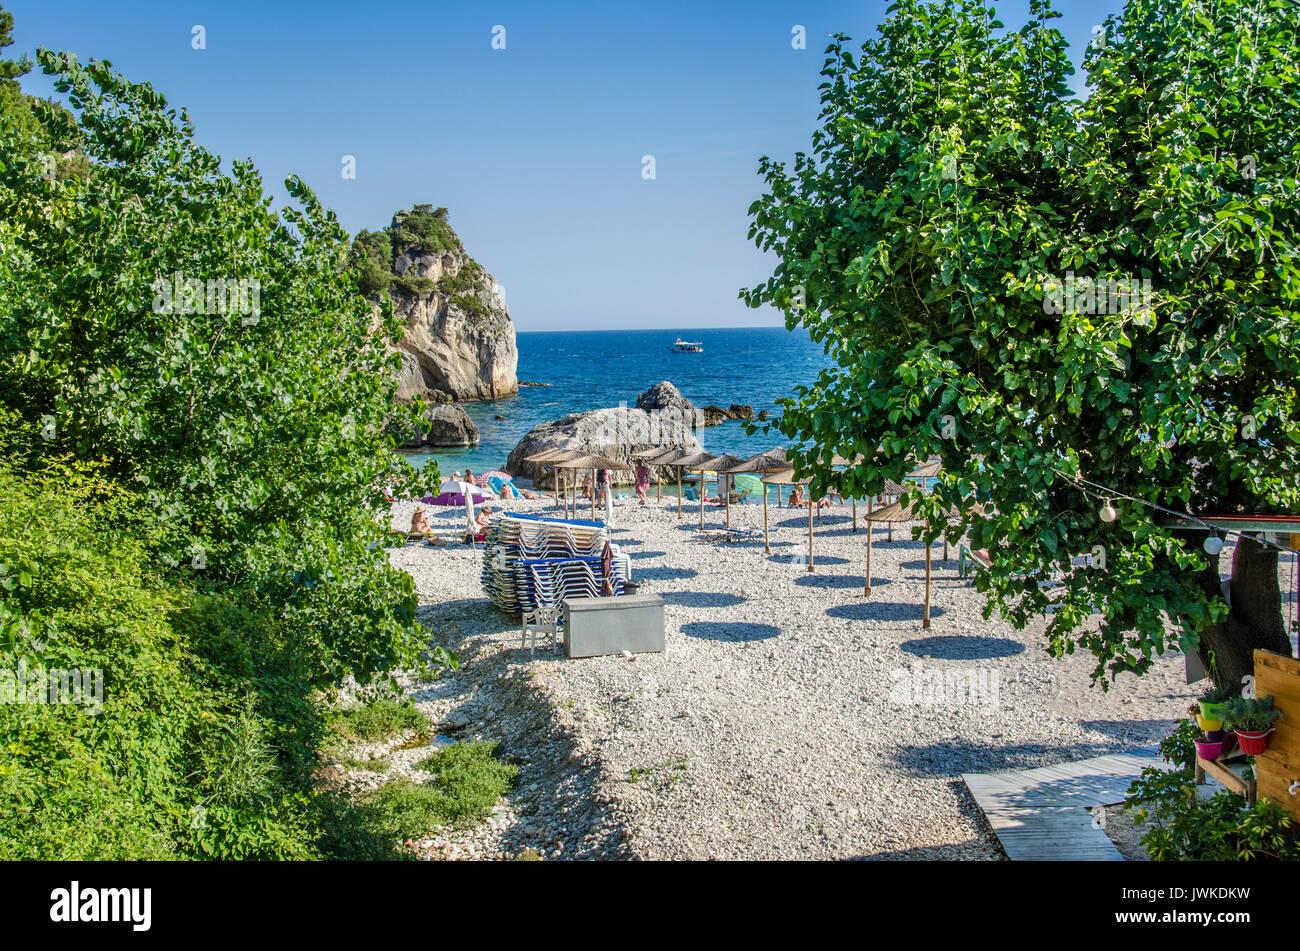 Krioneri Beach - Parga, Greece - Stock Image